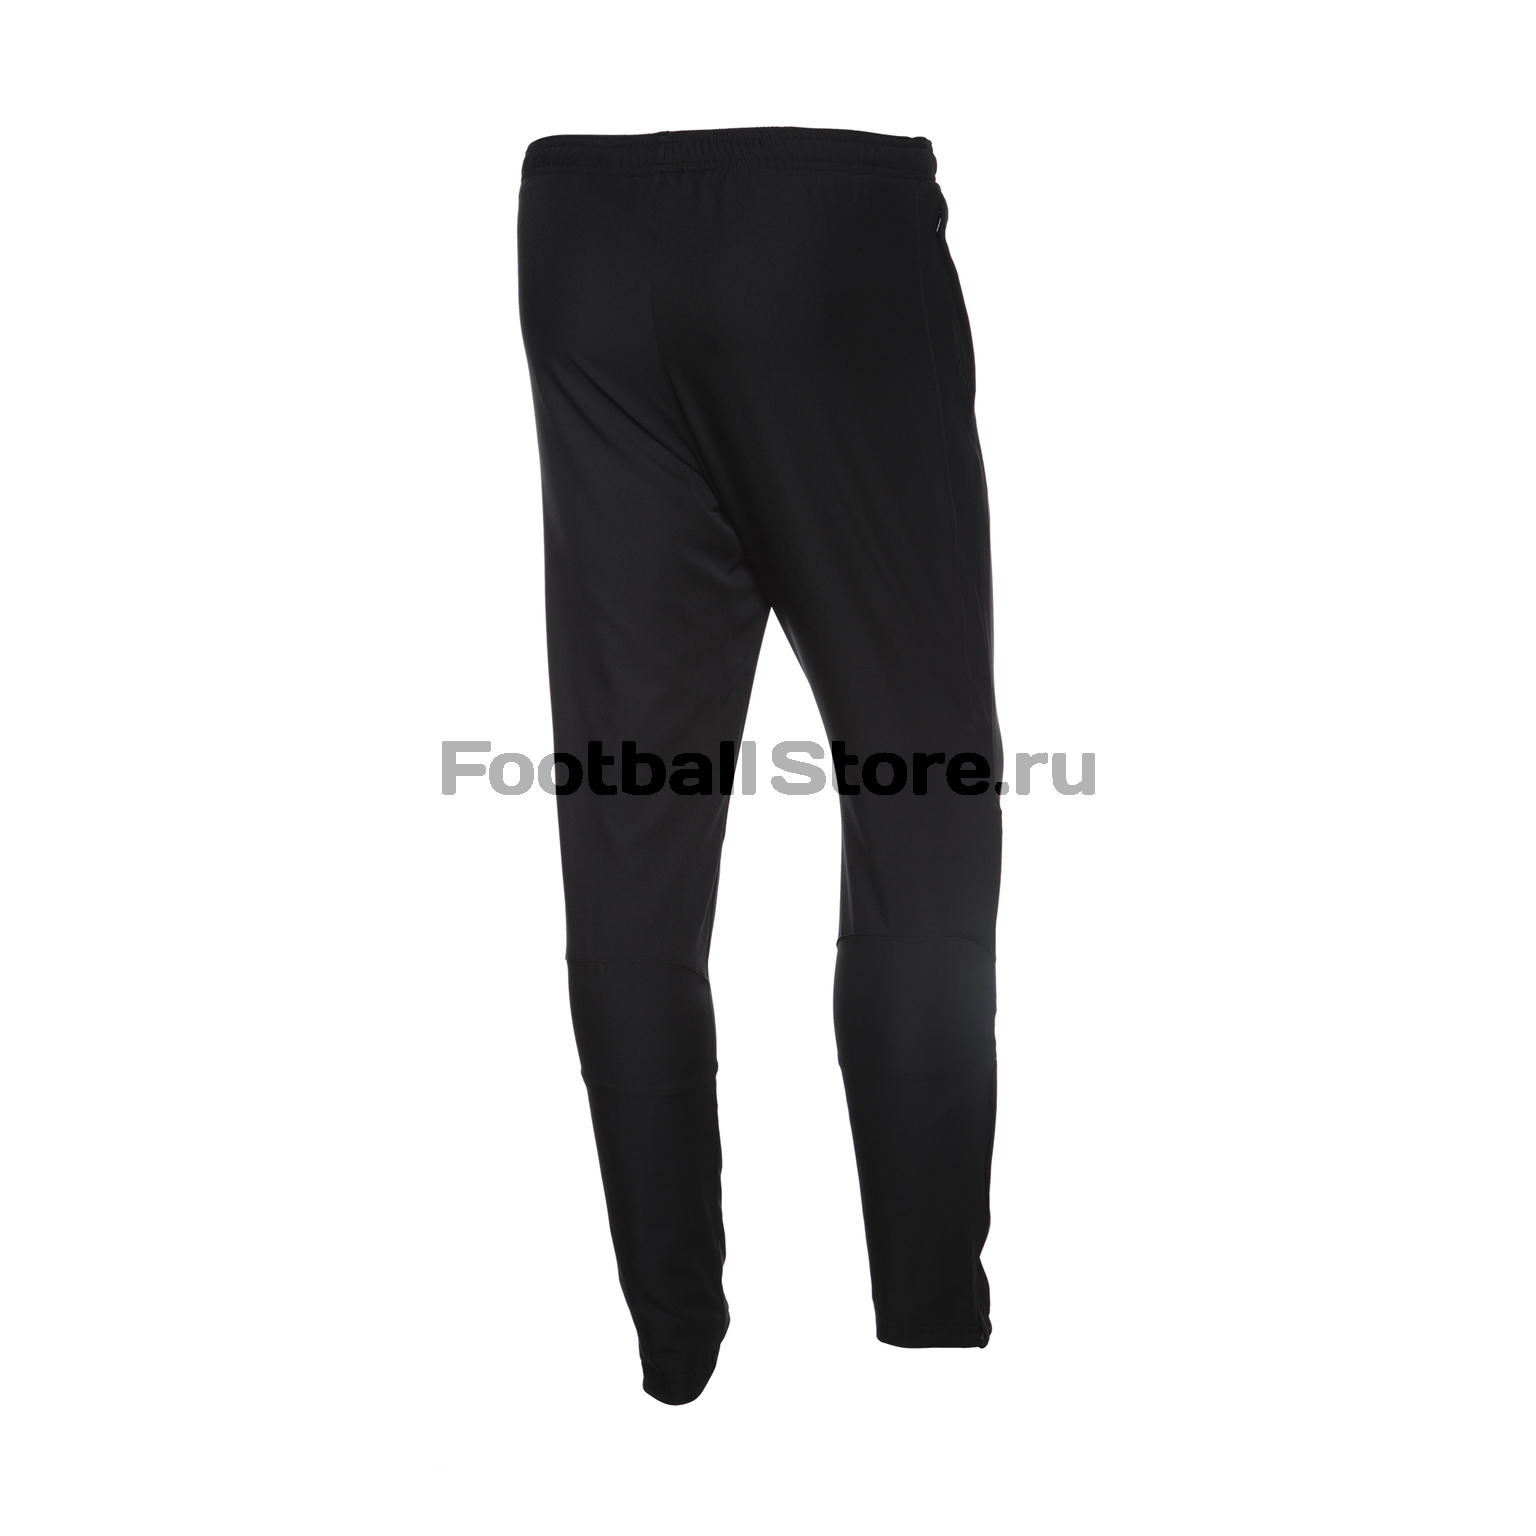 7d2e4bd3 Костюм спортивный Nike Dry Academy18 TRK Suit W 893709-361 – купить ...